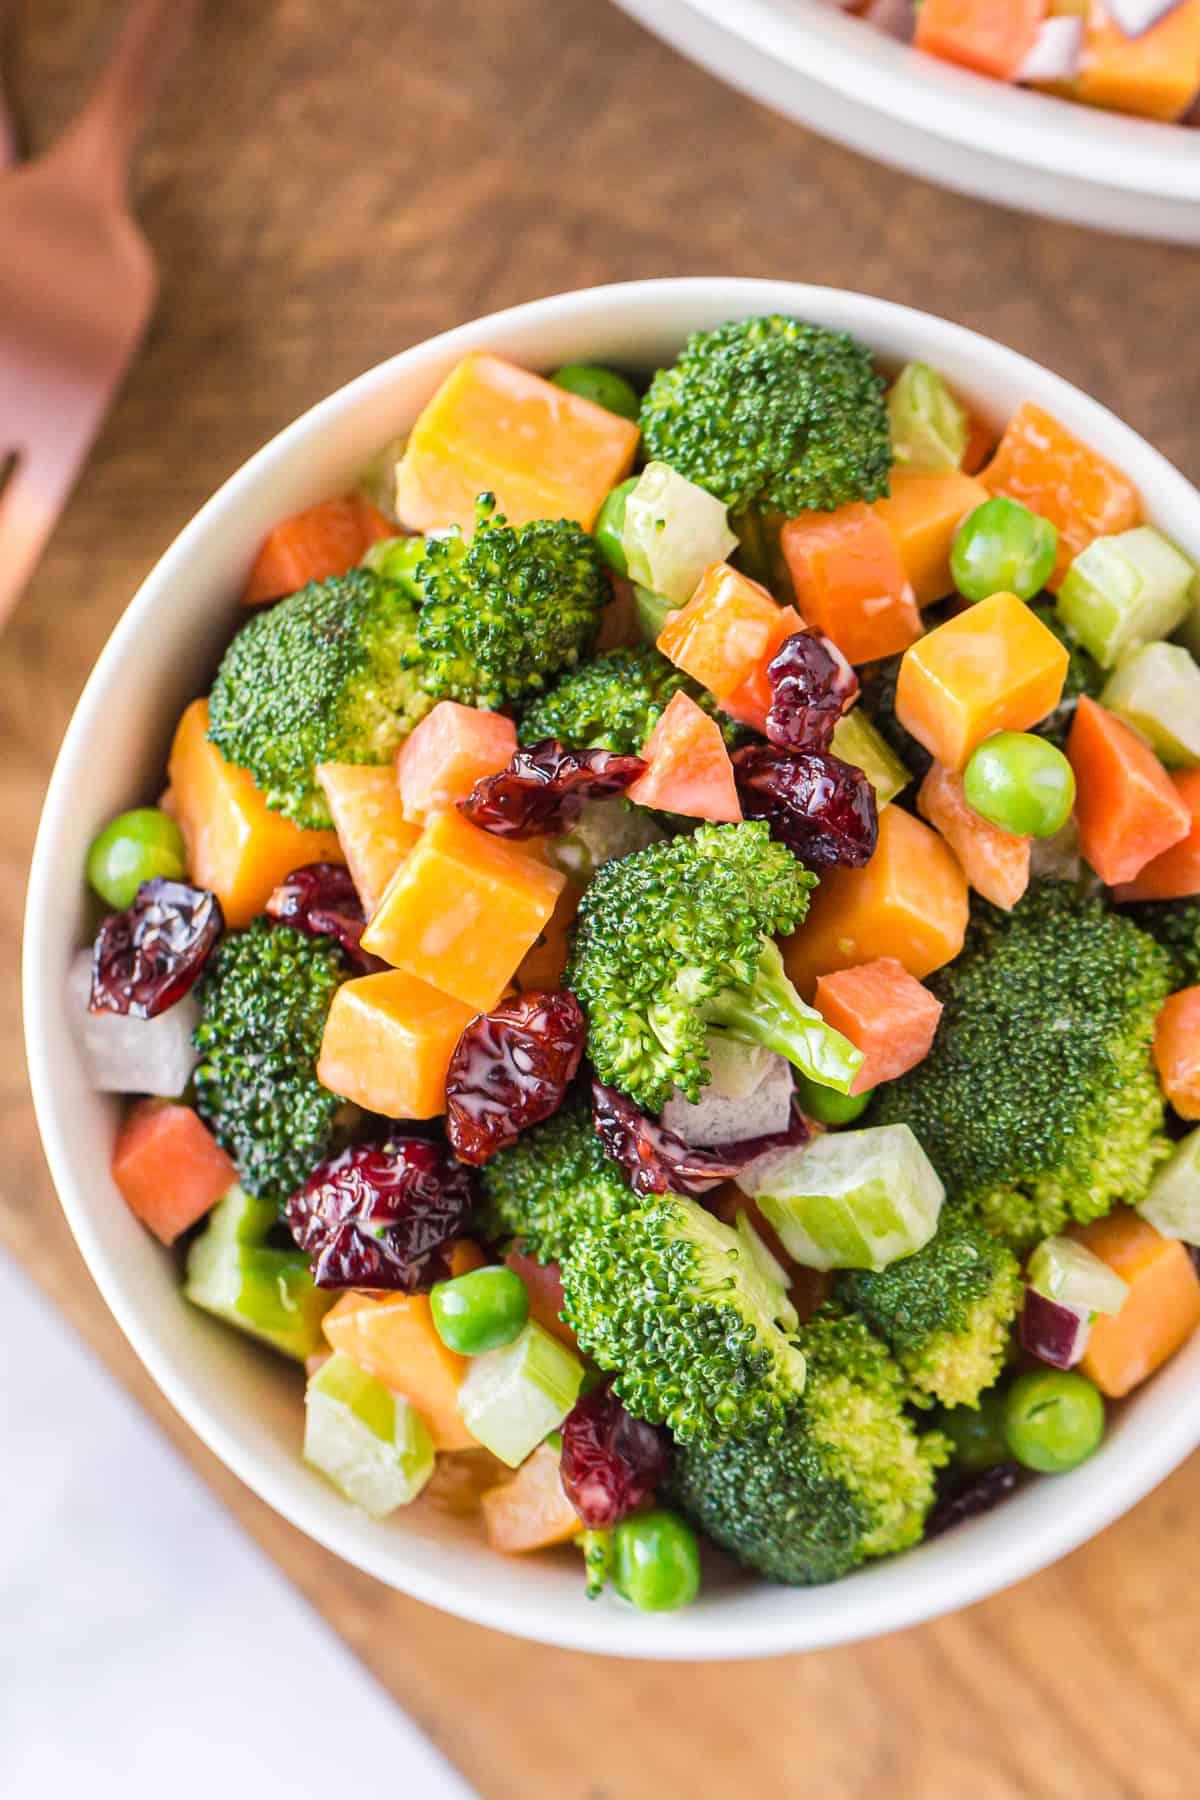 bowl with cheesy broccoli salad